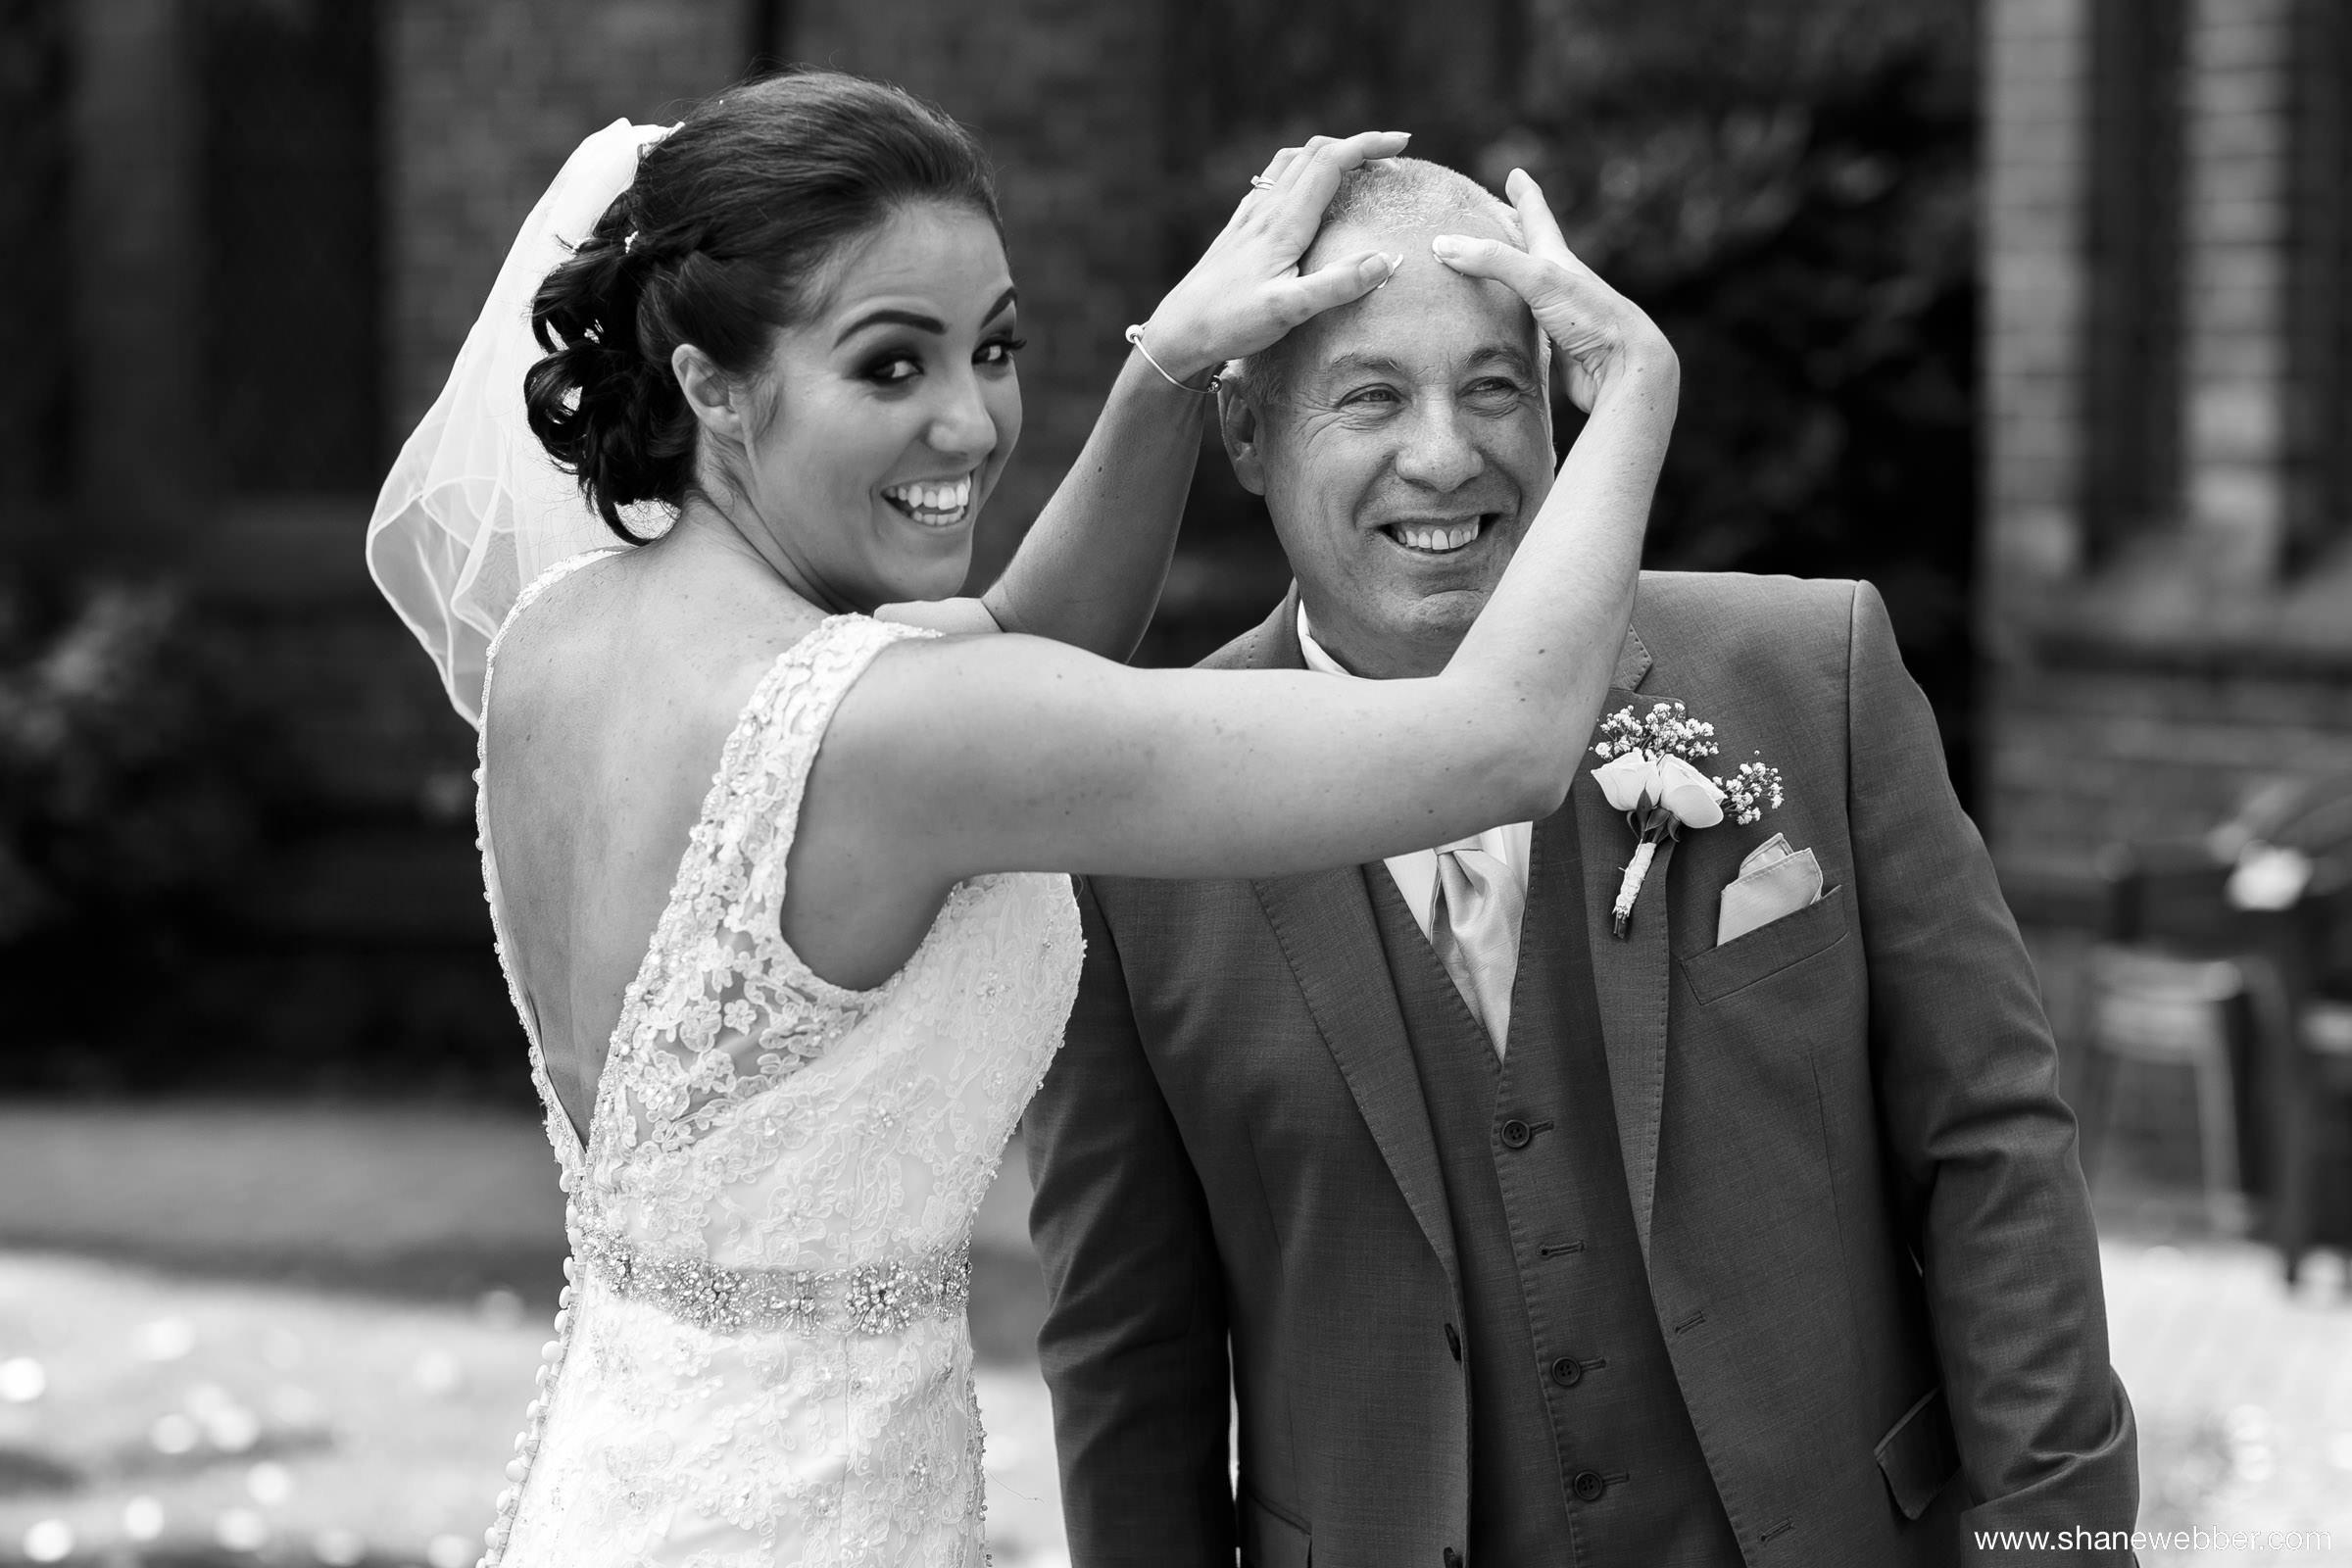 Natural wedding photography at the Gorton Monastery Manchester